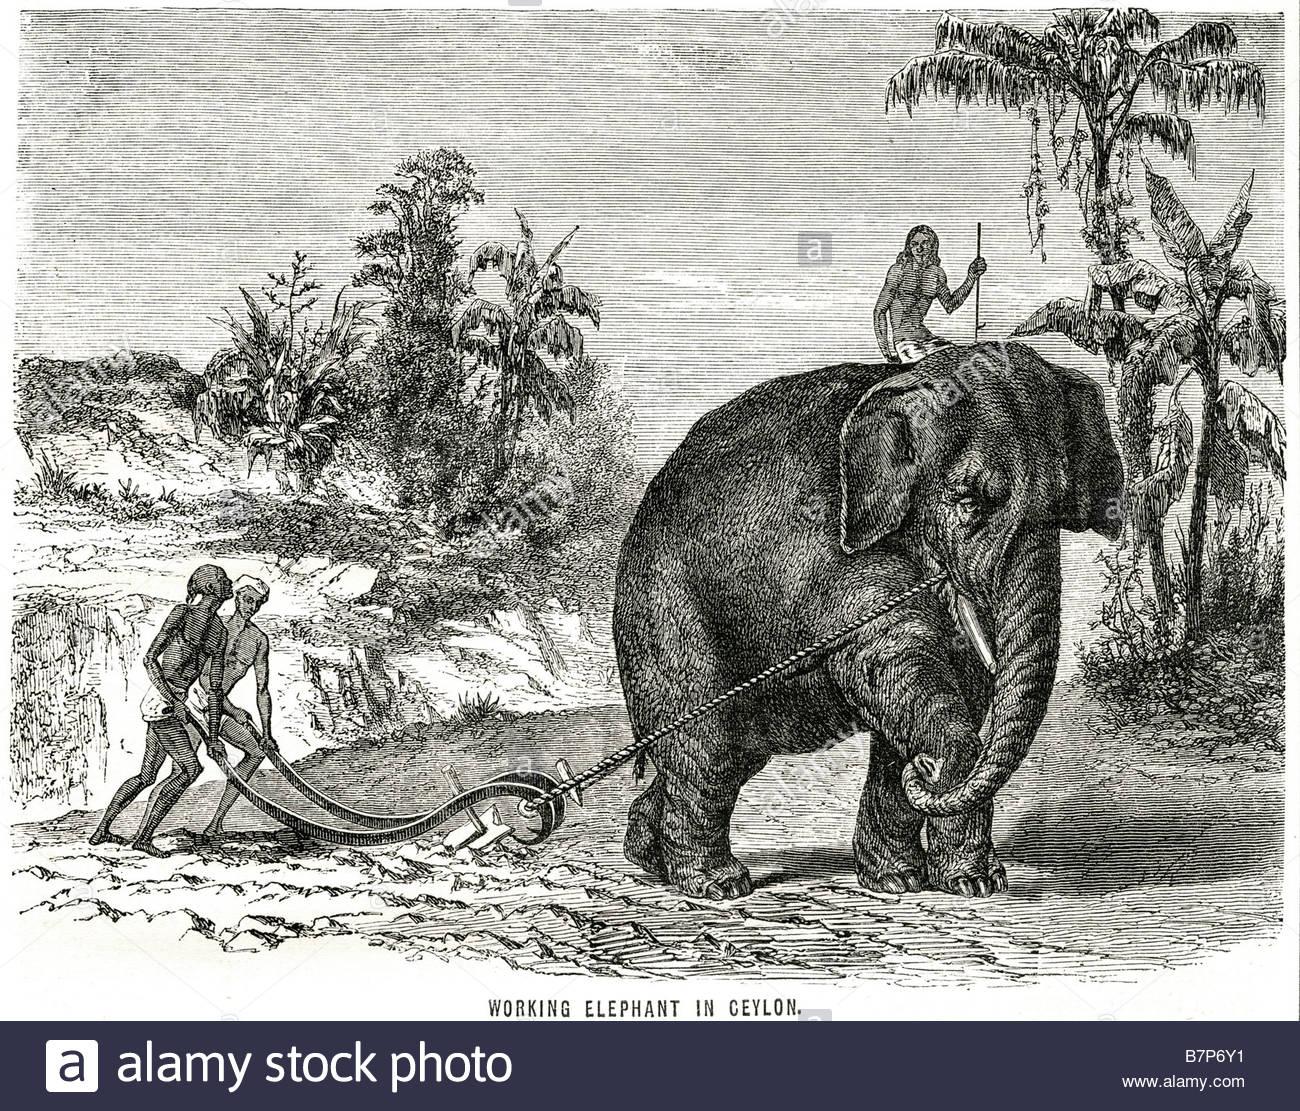 working-elephant-ceylon-animal-farming-land-traditional-wildlife-nature-B7P6Y1